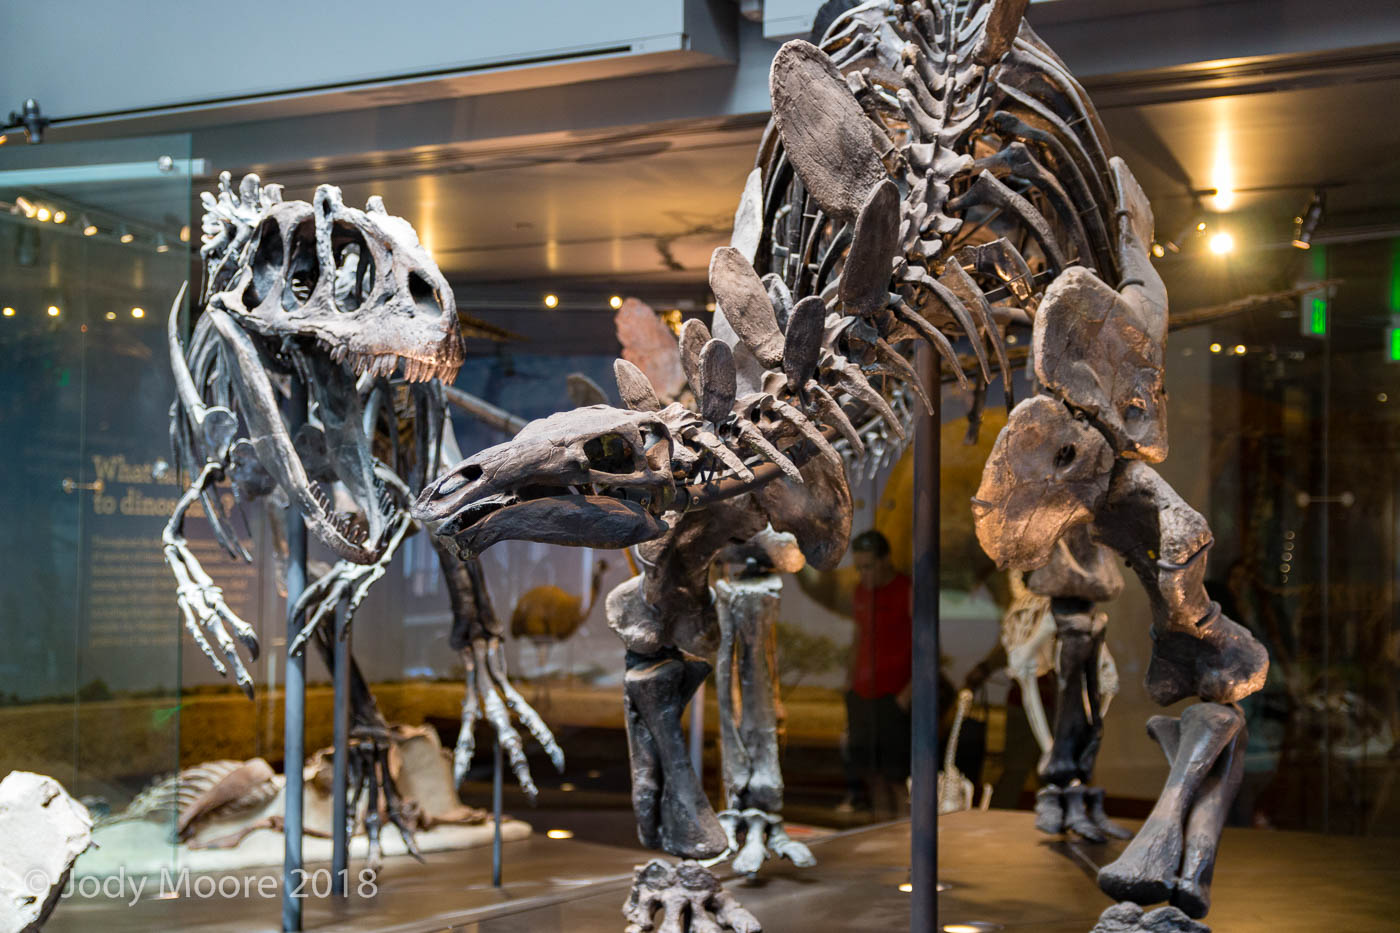 Allosaurus threatens to make a meal of Stegosaurus at the Los Angles County Natural History Musuem.